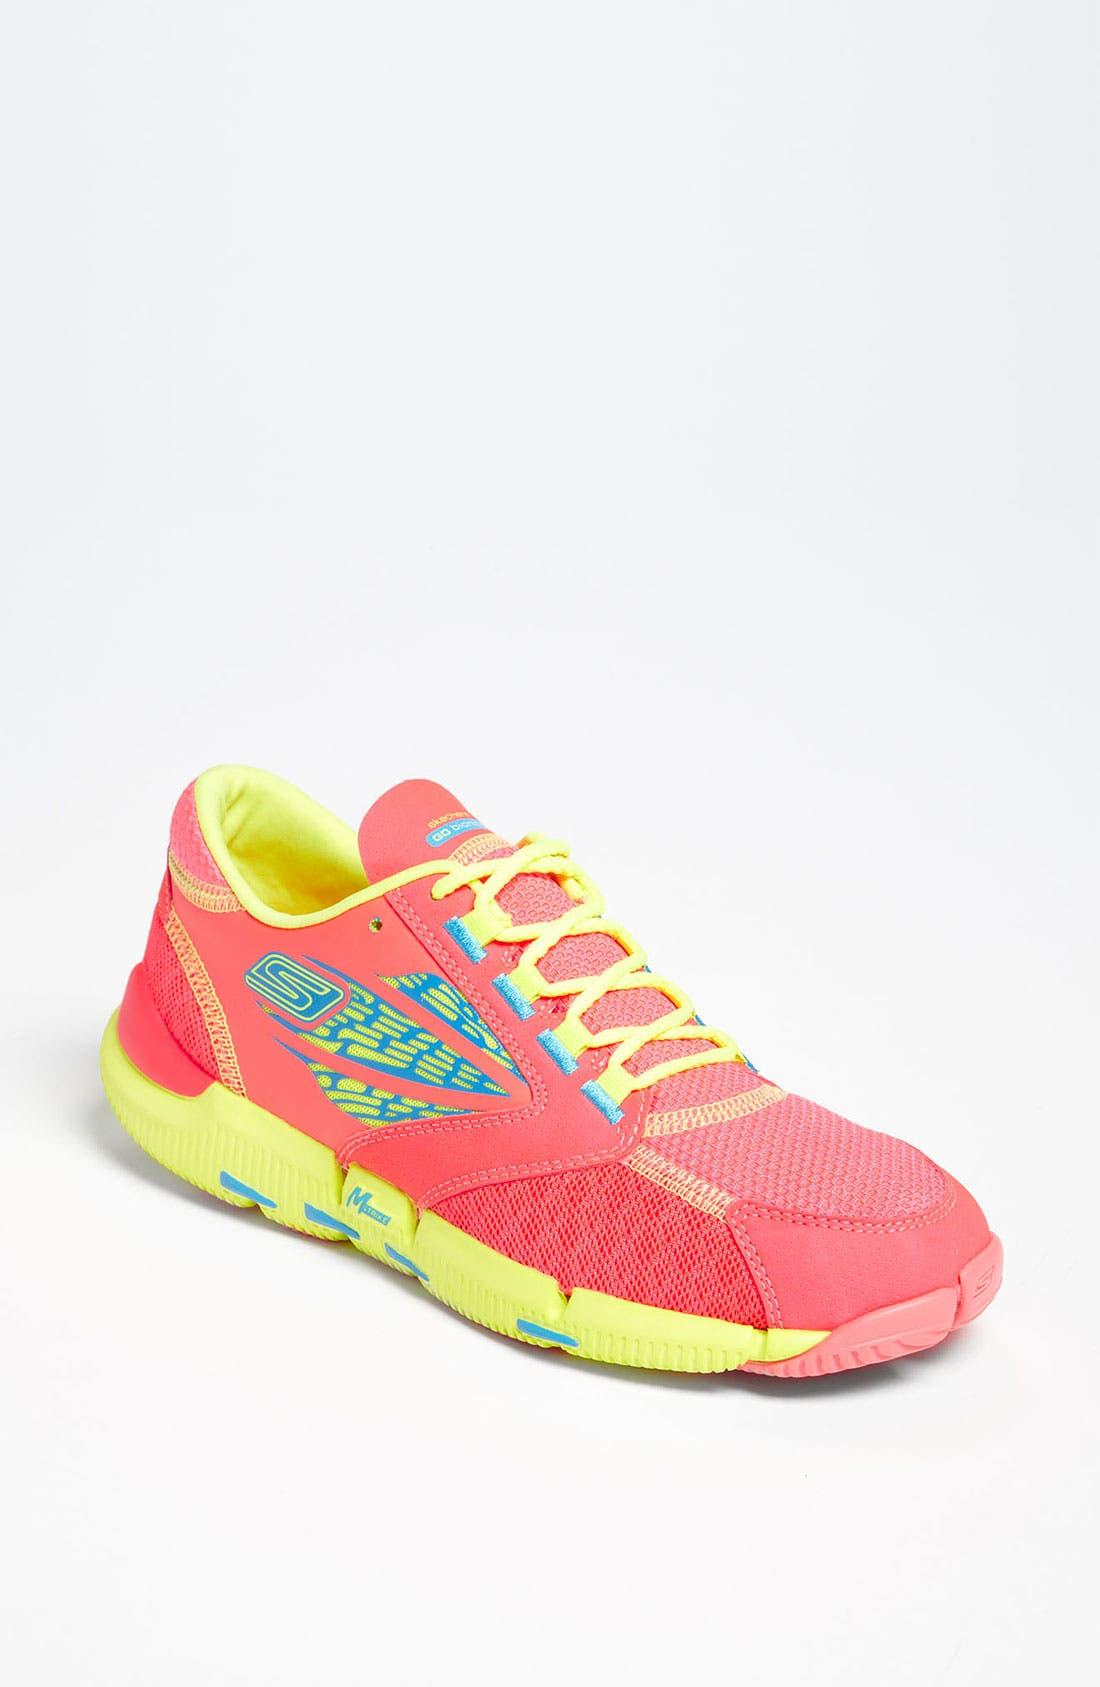 Alternate Image 1 Selected - SKECHERS 'GOBionic Ride' Running Shoe (Women)